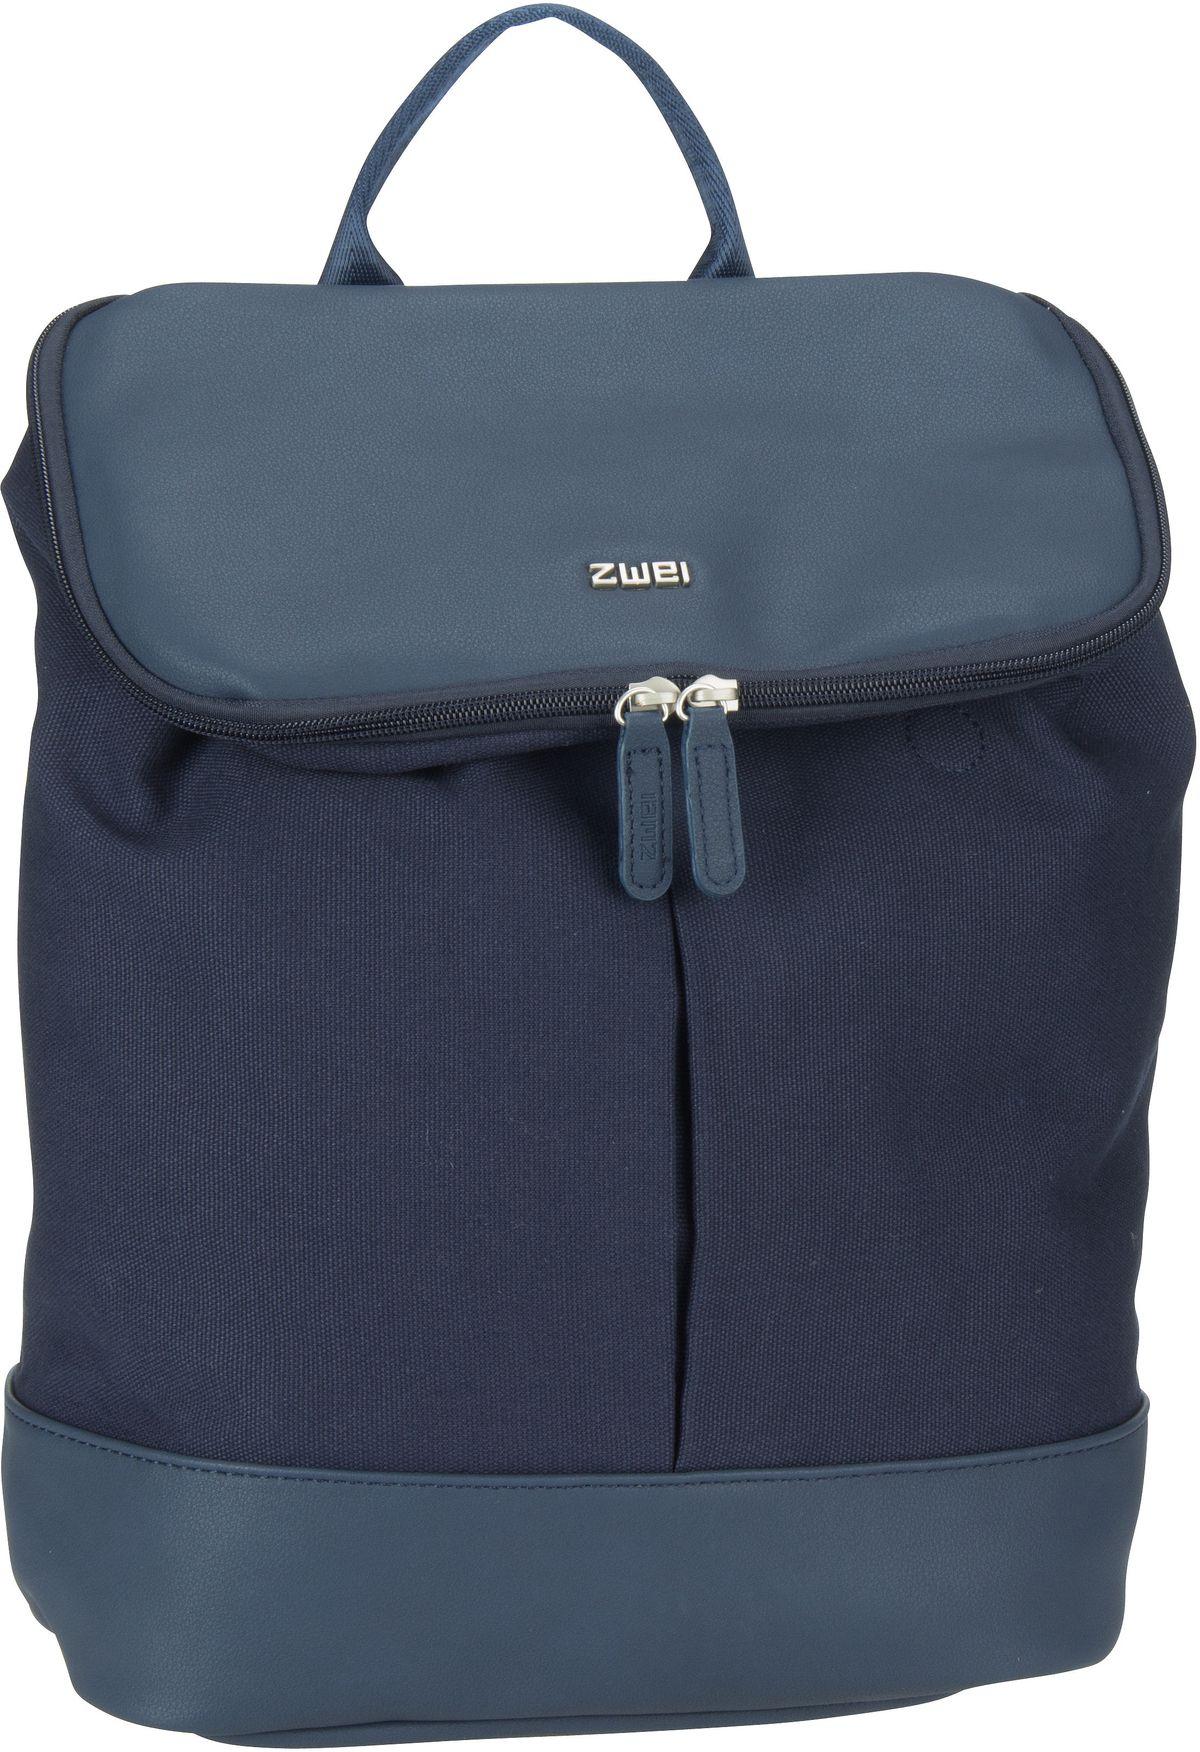 Rucksack / Daypack Paula PAR140 Blue (10 Liter)